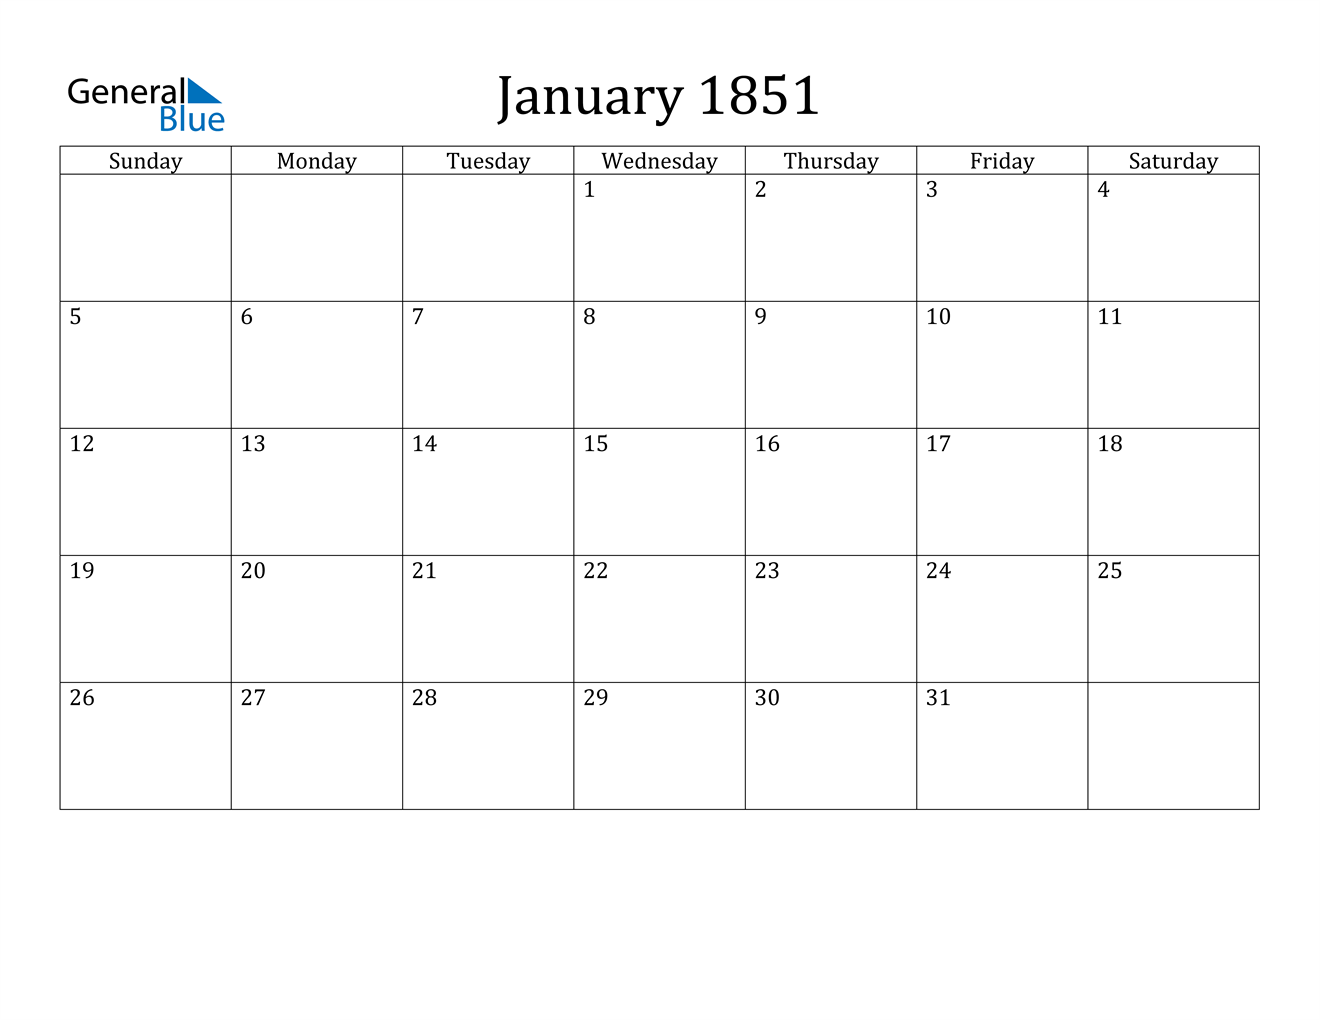 Image of January 1851 Calendar